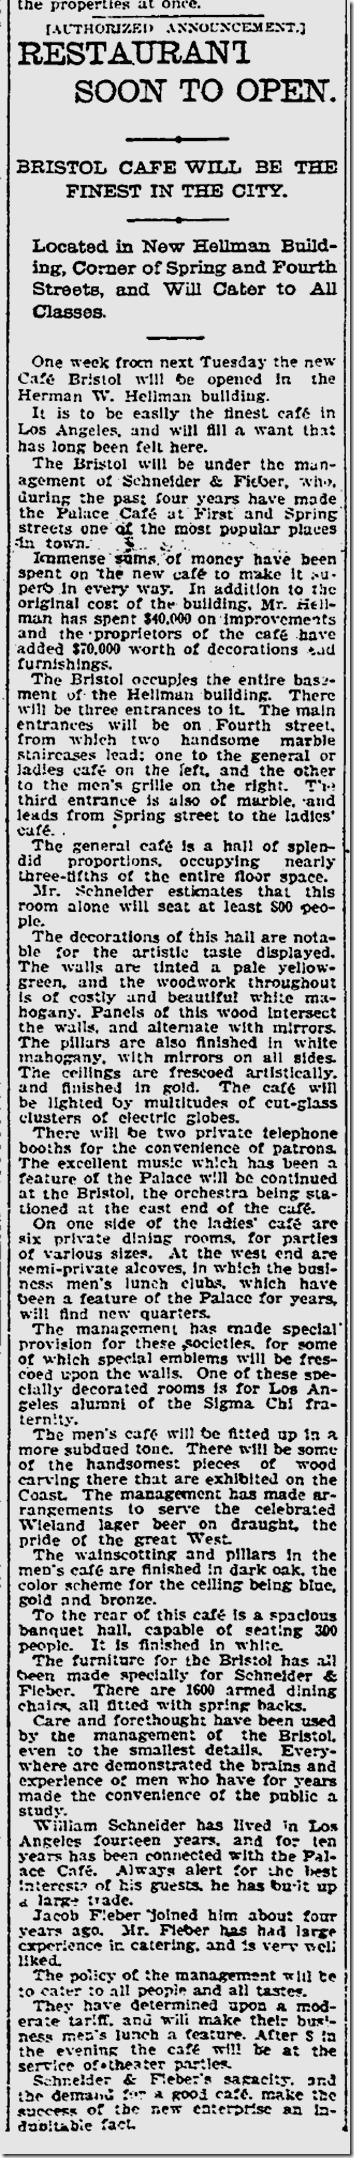 Dec. 12, 1904, Cafe Bristol